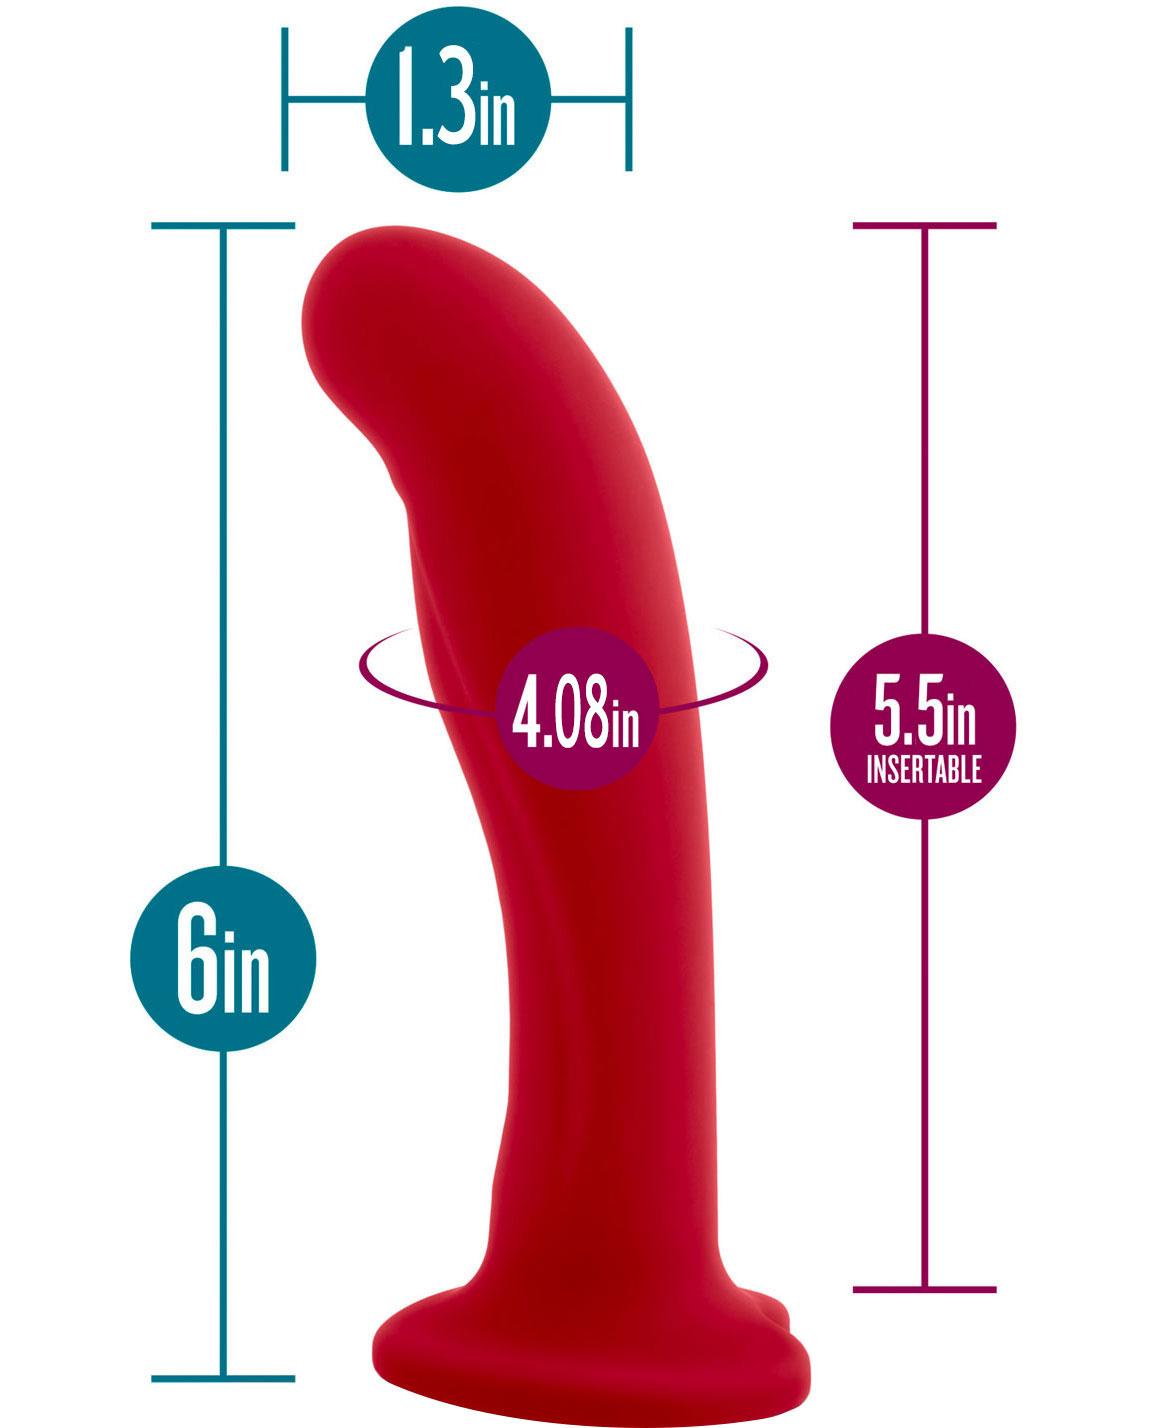 Temptasia Jezebel Silicone Dildo - Measurement